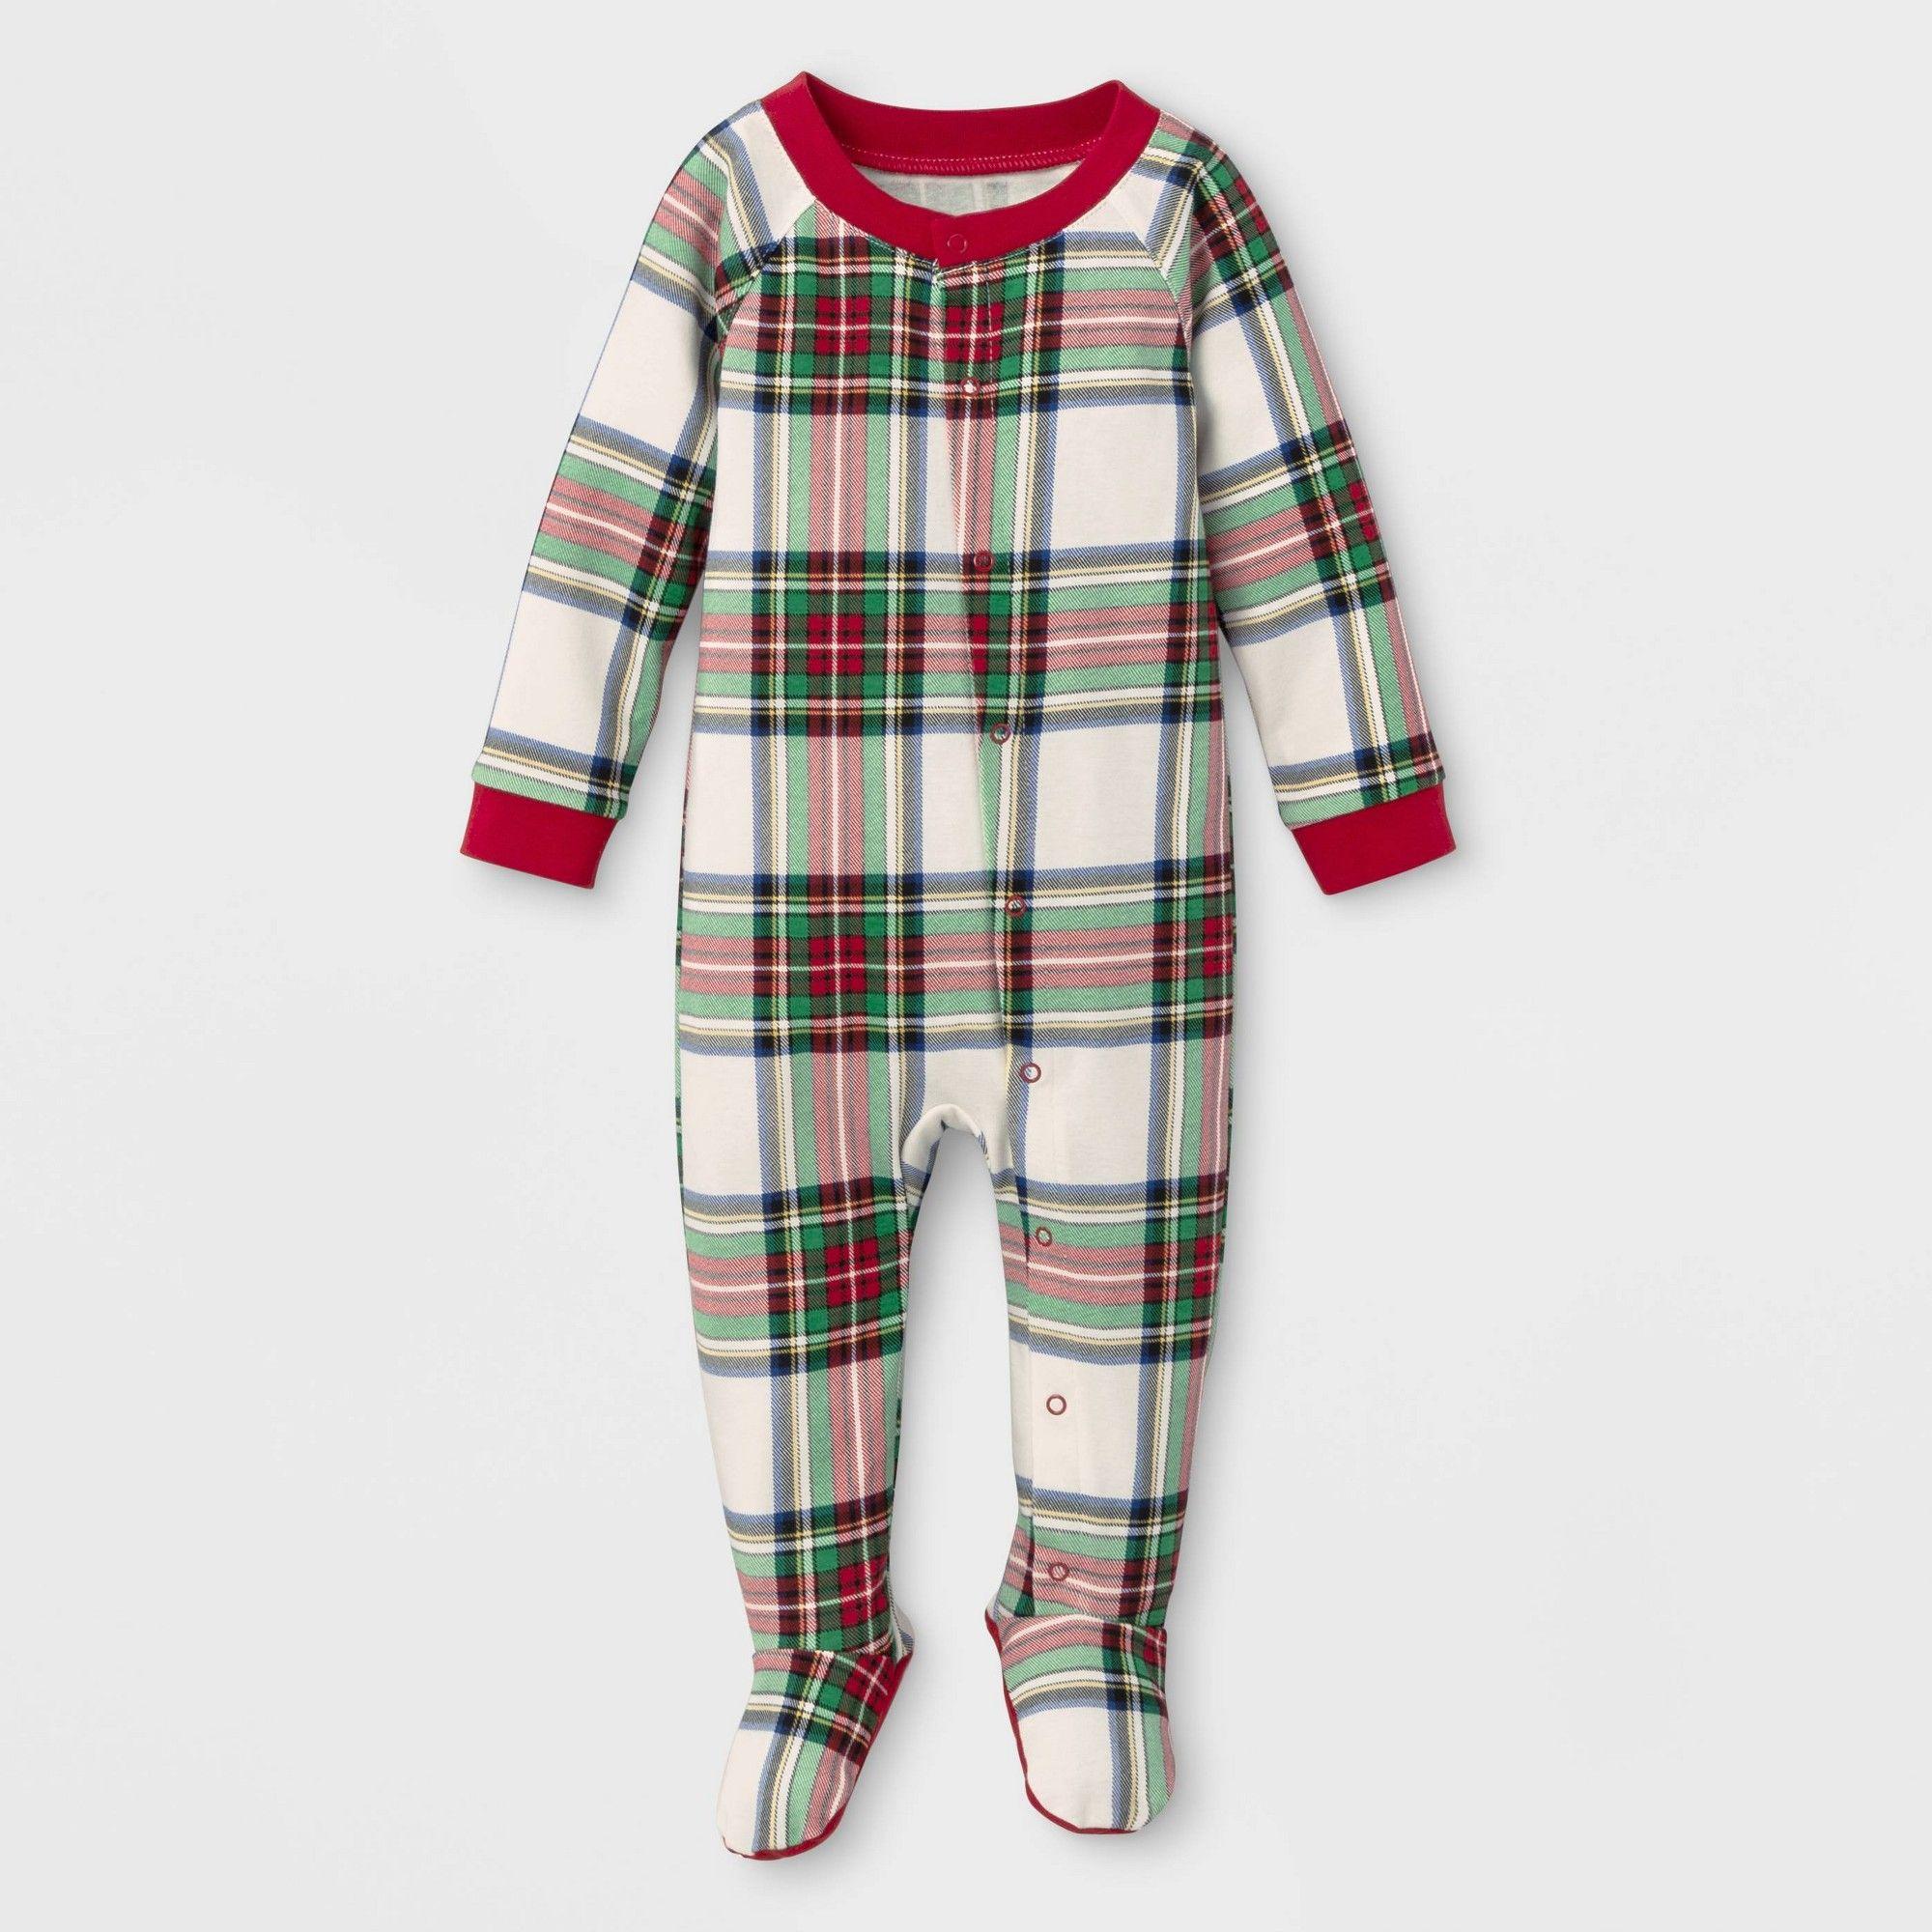 Baby Plaid Holiday Tartan Flannel One Piece Pajama